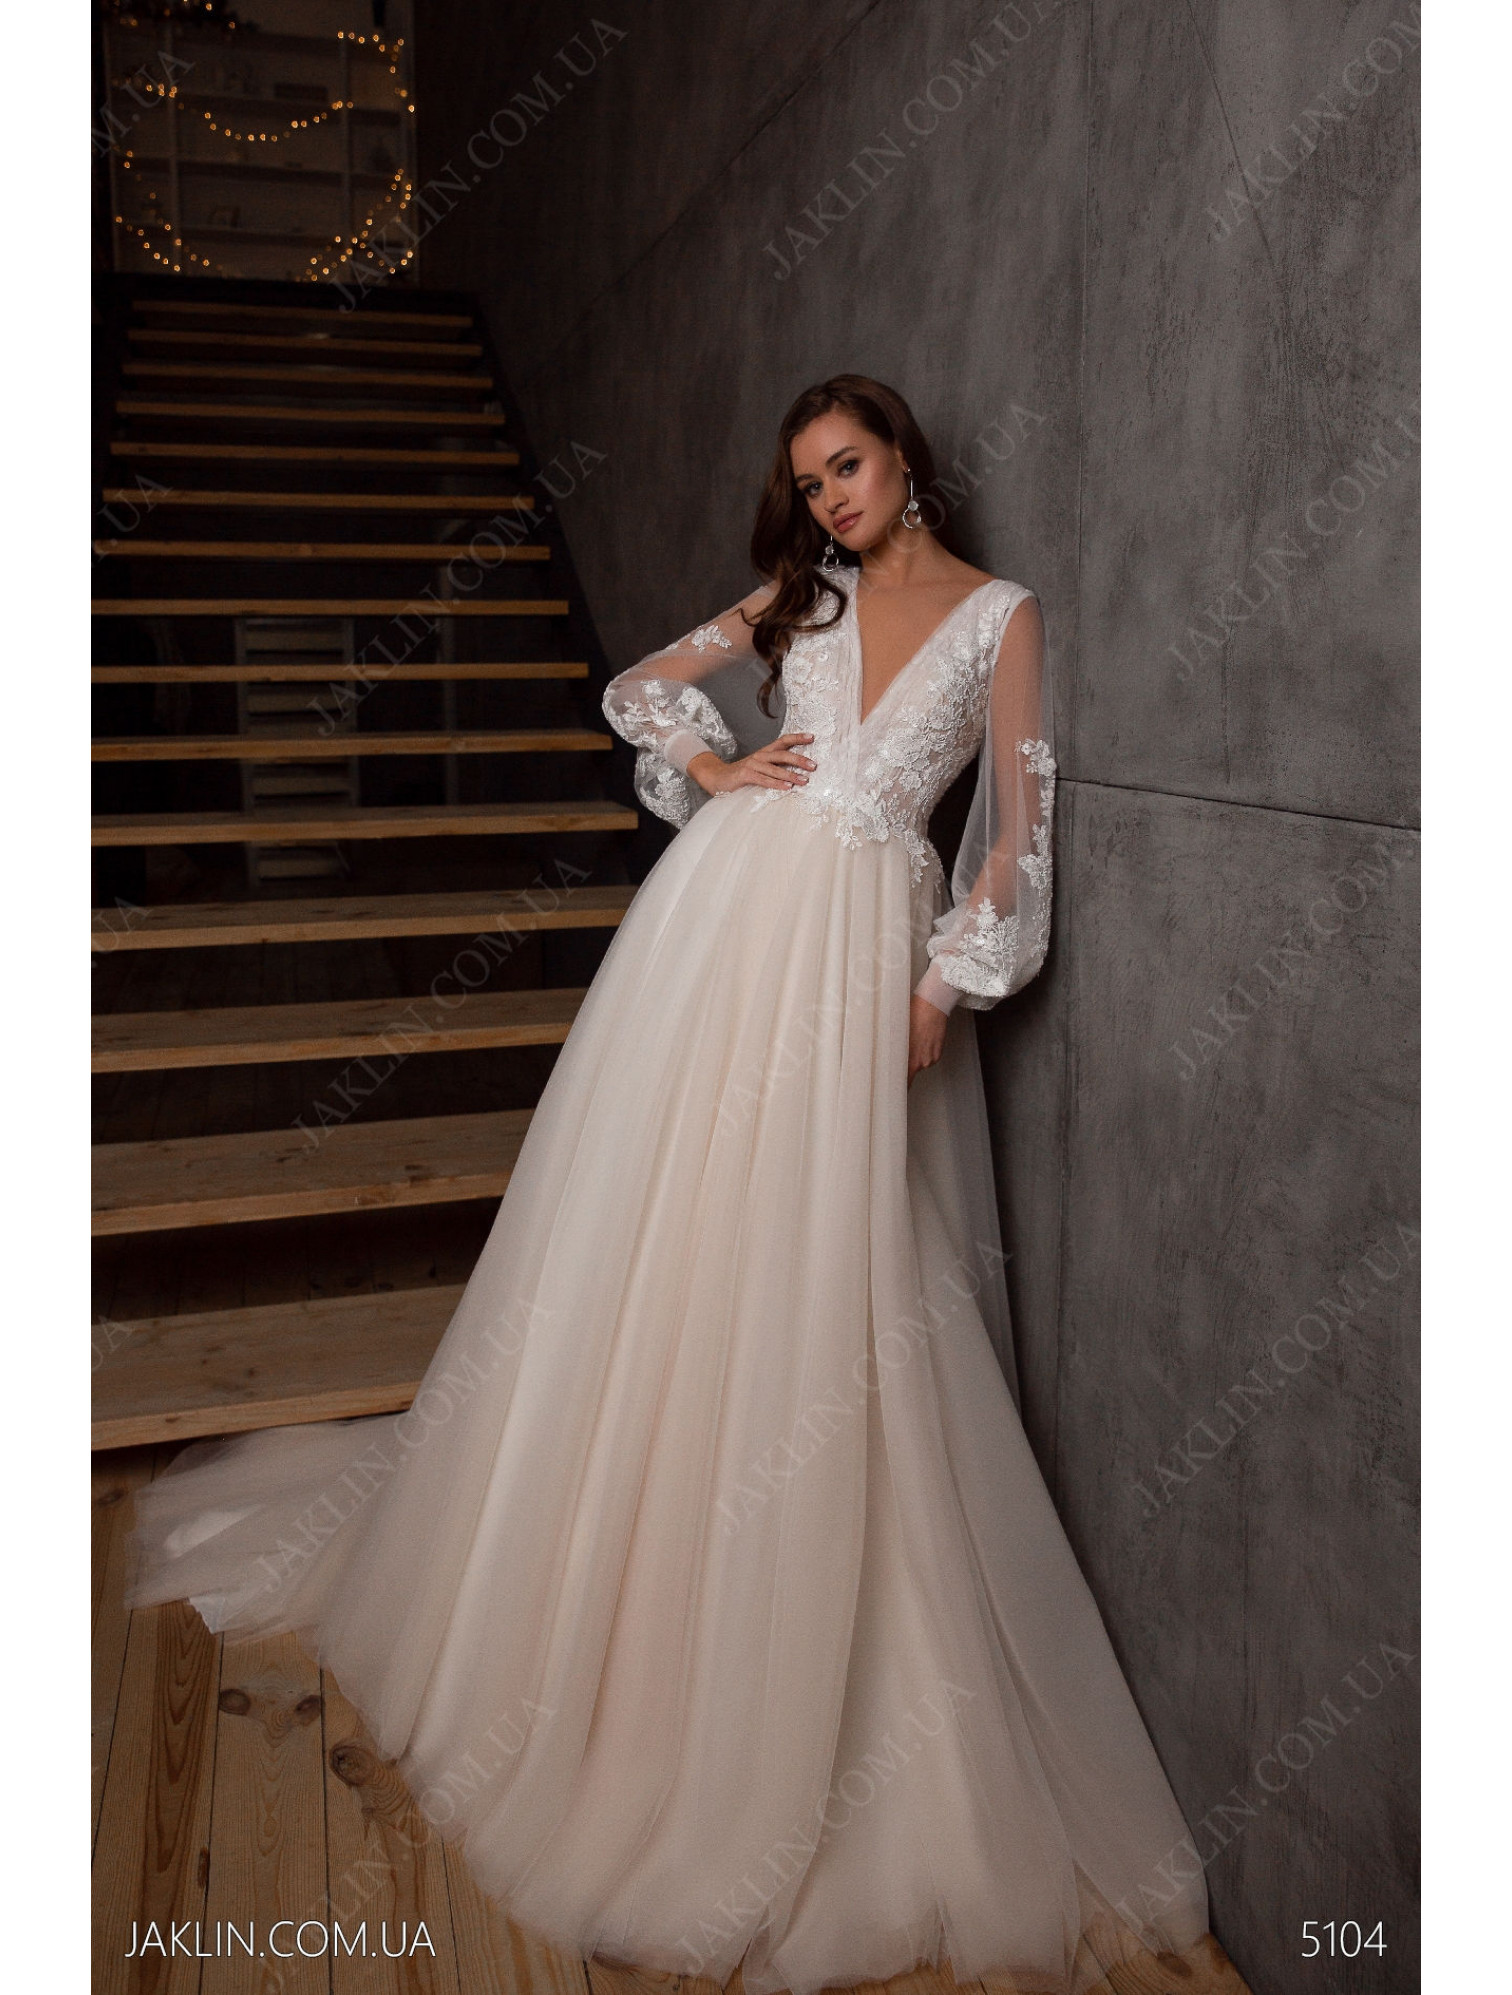 Wedding dress 5104